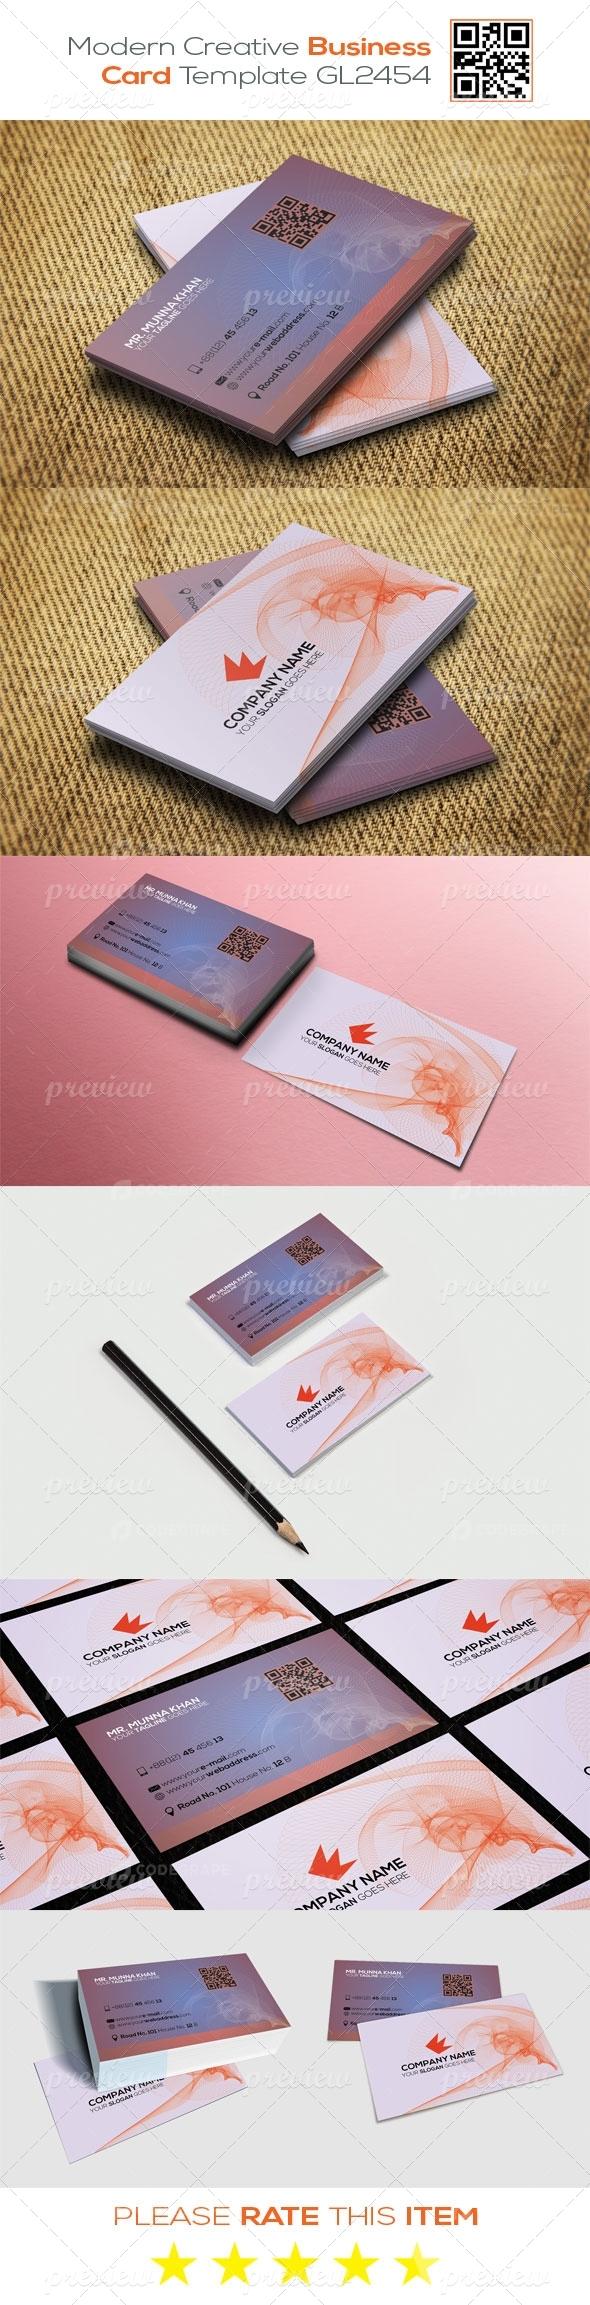 Modern Creative Business Card Template GL2454